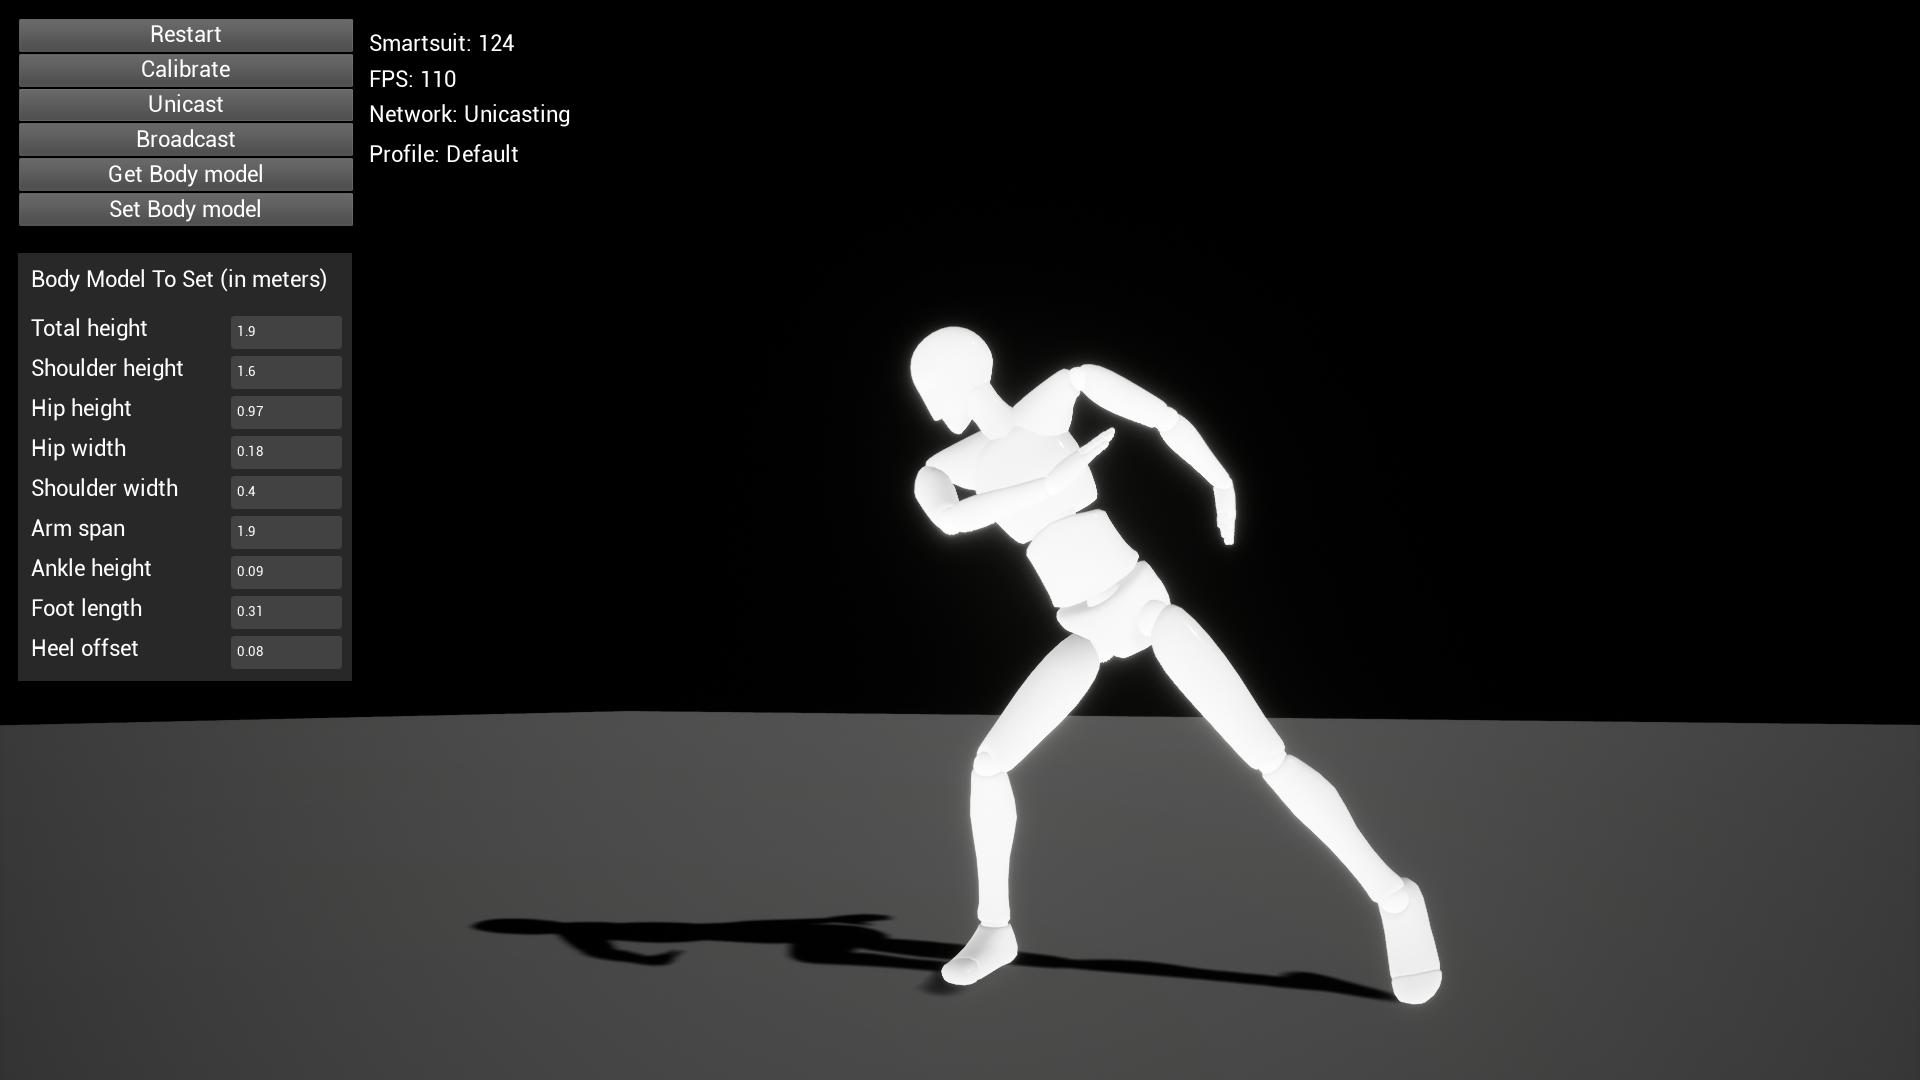 Smartsuit plugin by rokoko electronics aps in code plugins ue4 share malvernweather Gallery